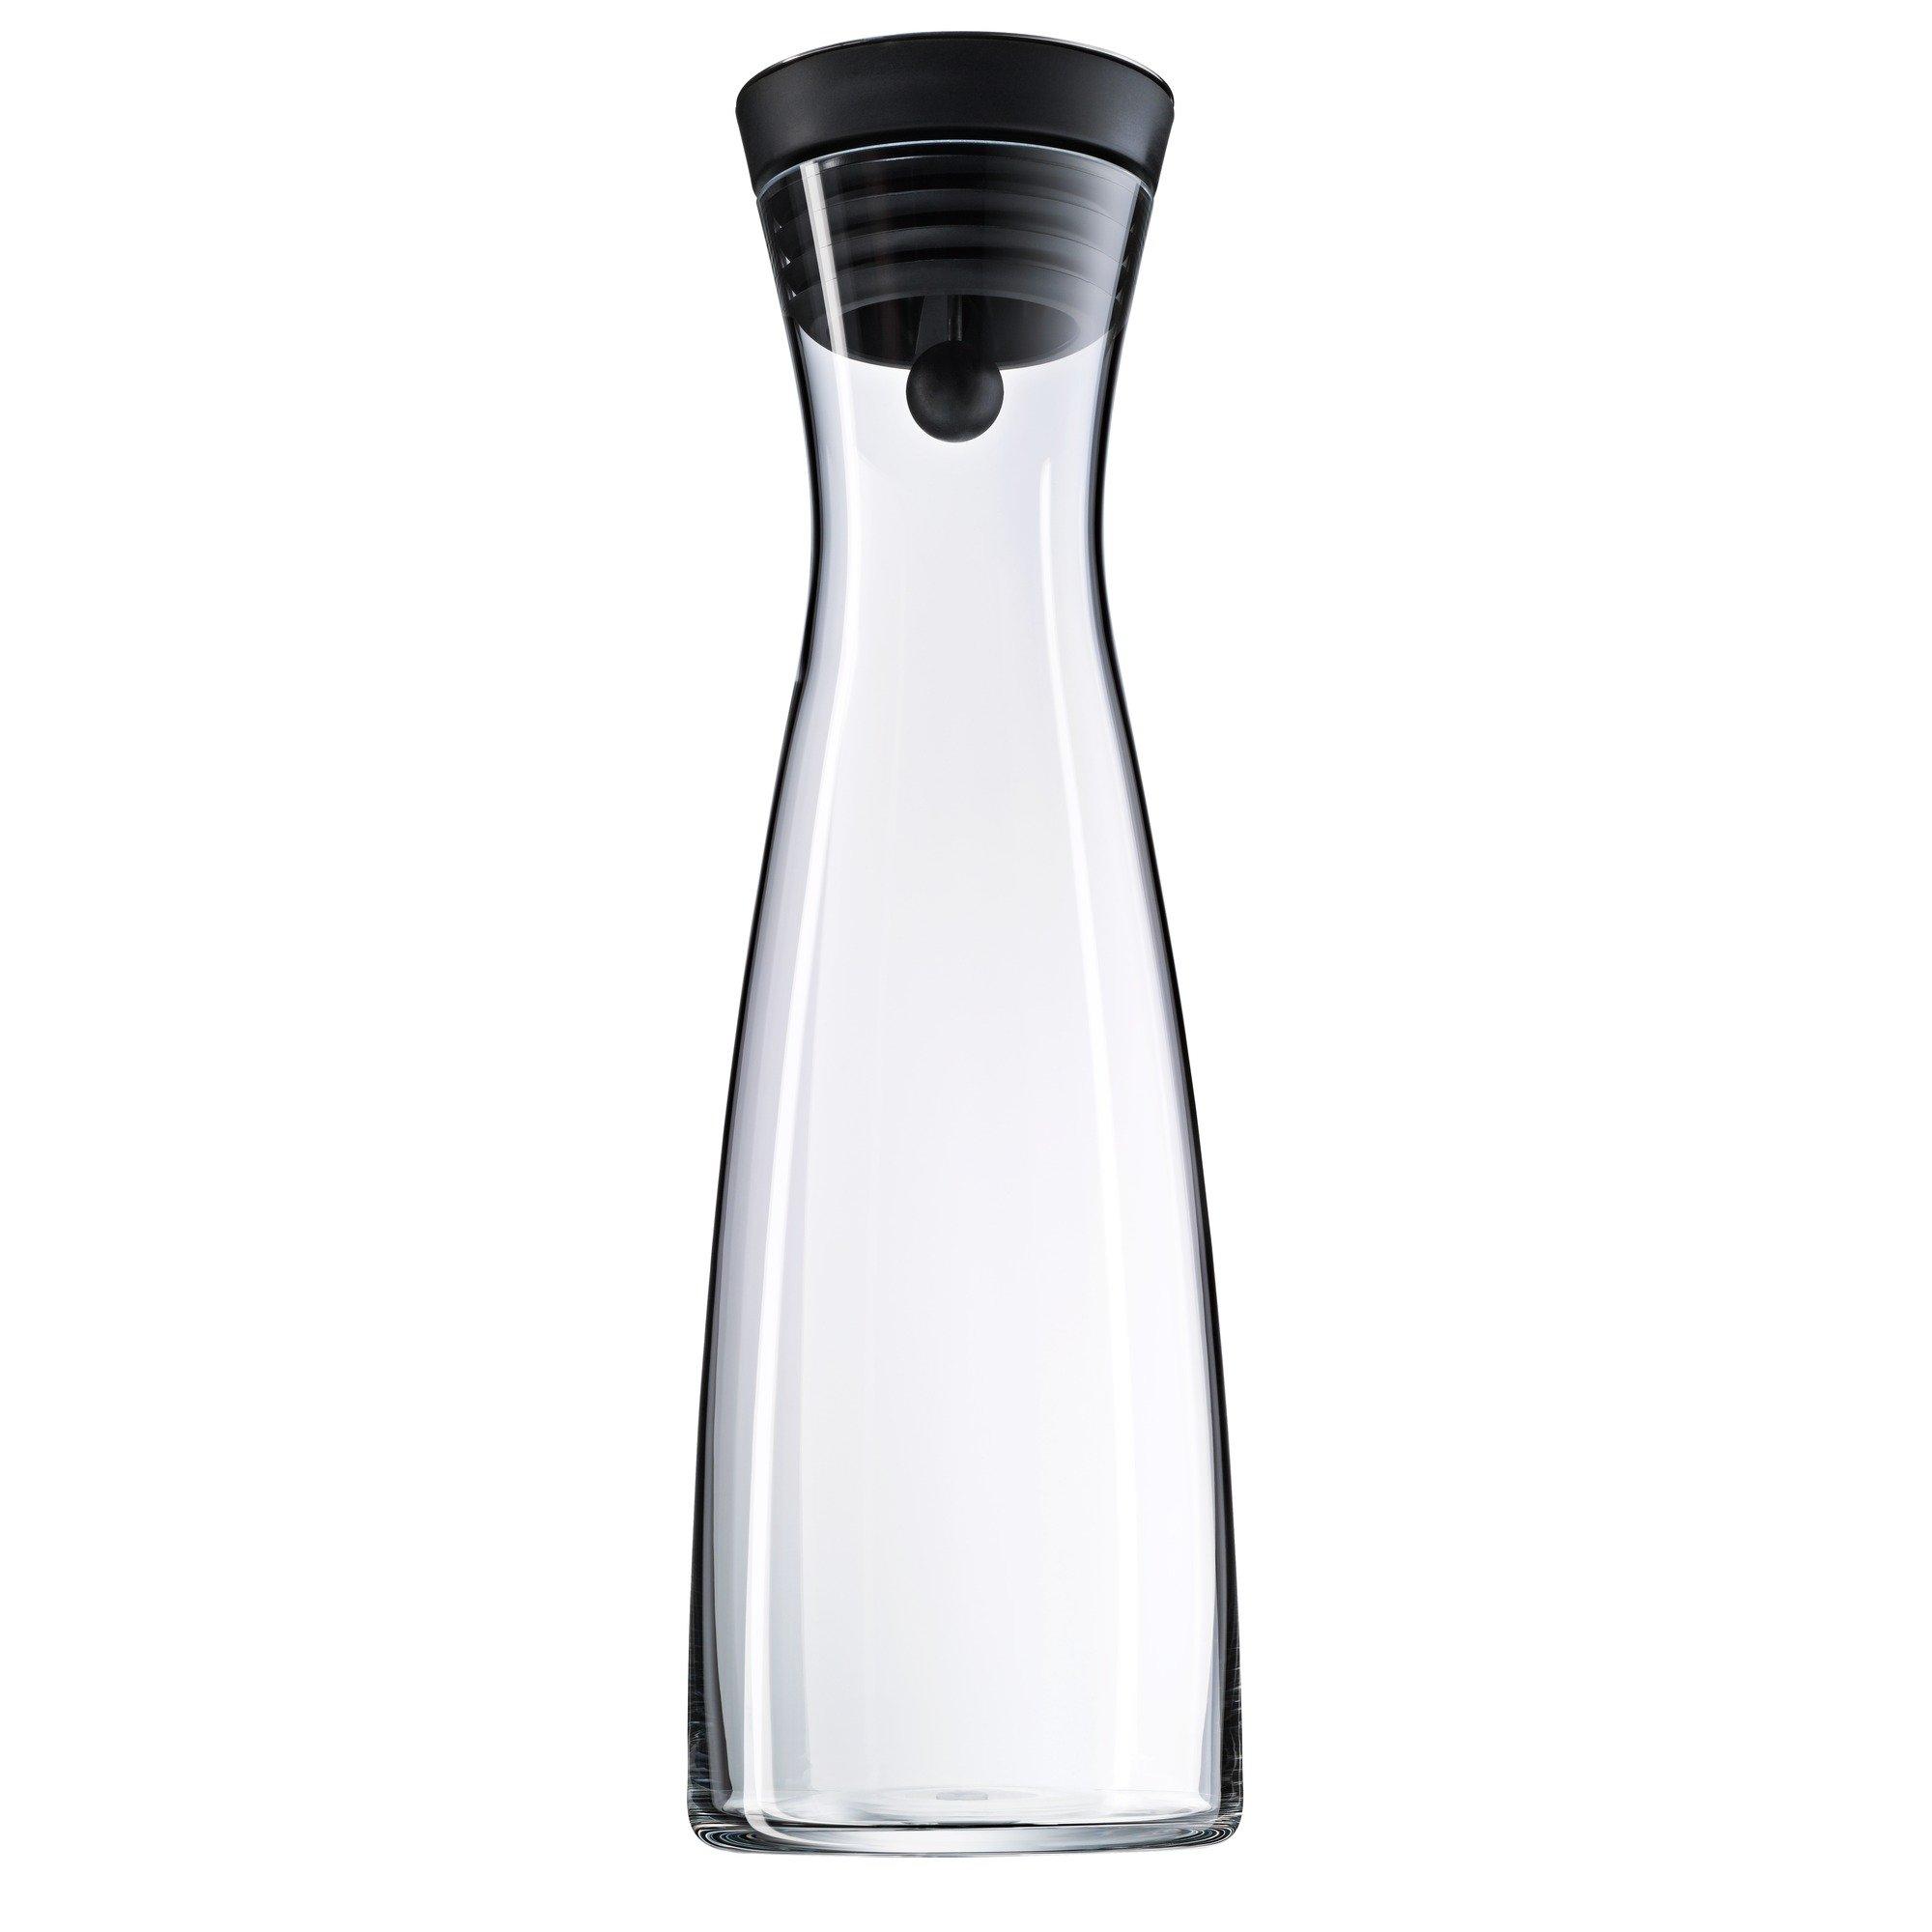 Wasserkaraffe 1,5 l schwarz Basic